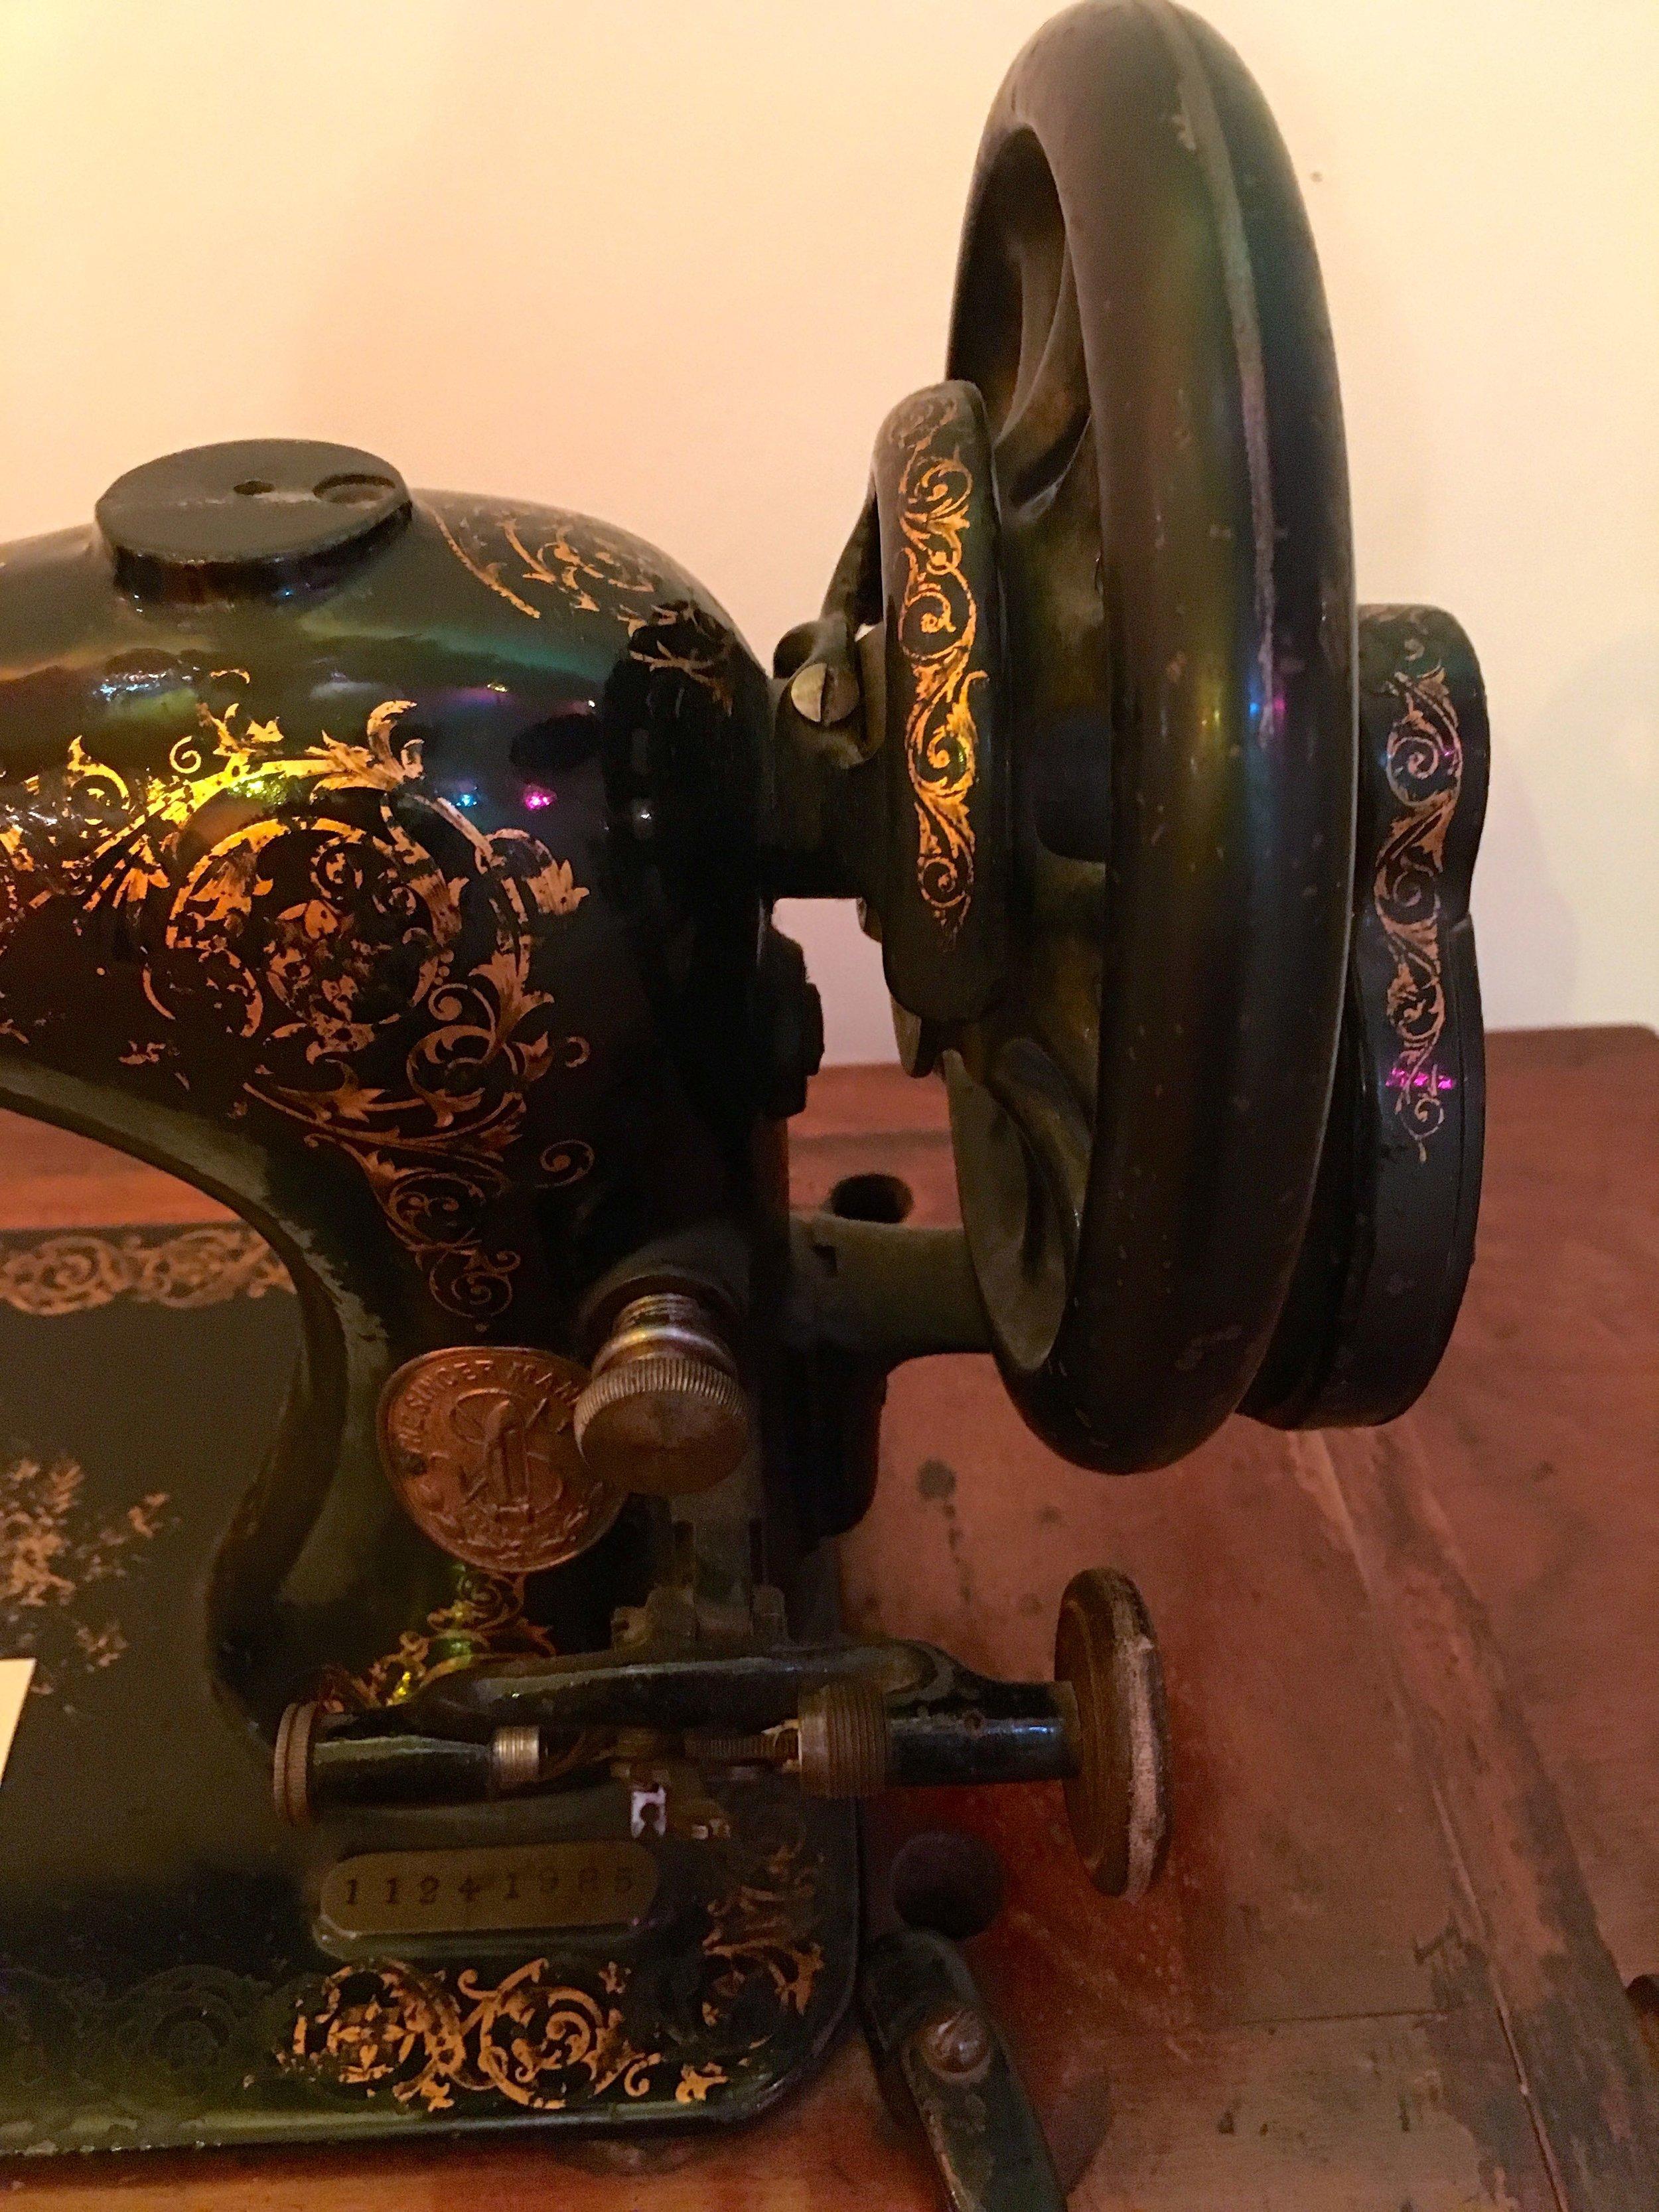 sewing machine at Killerton NT